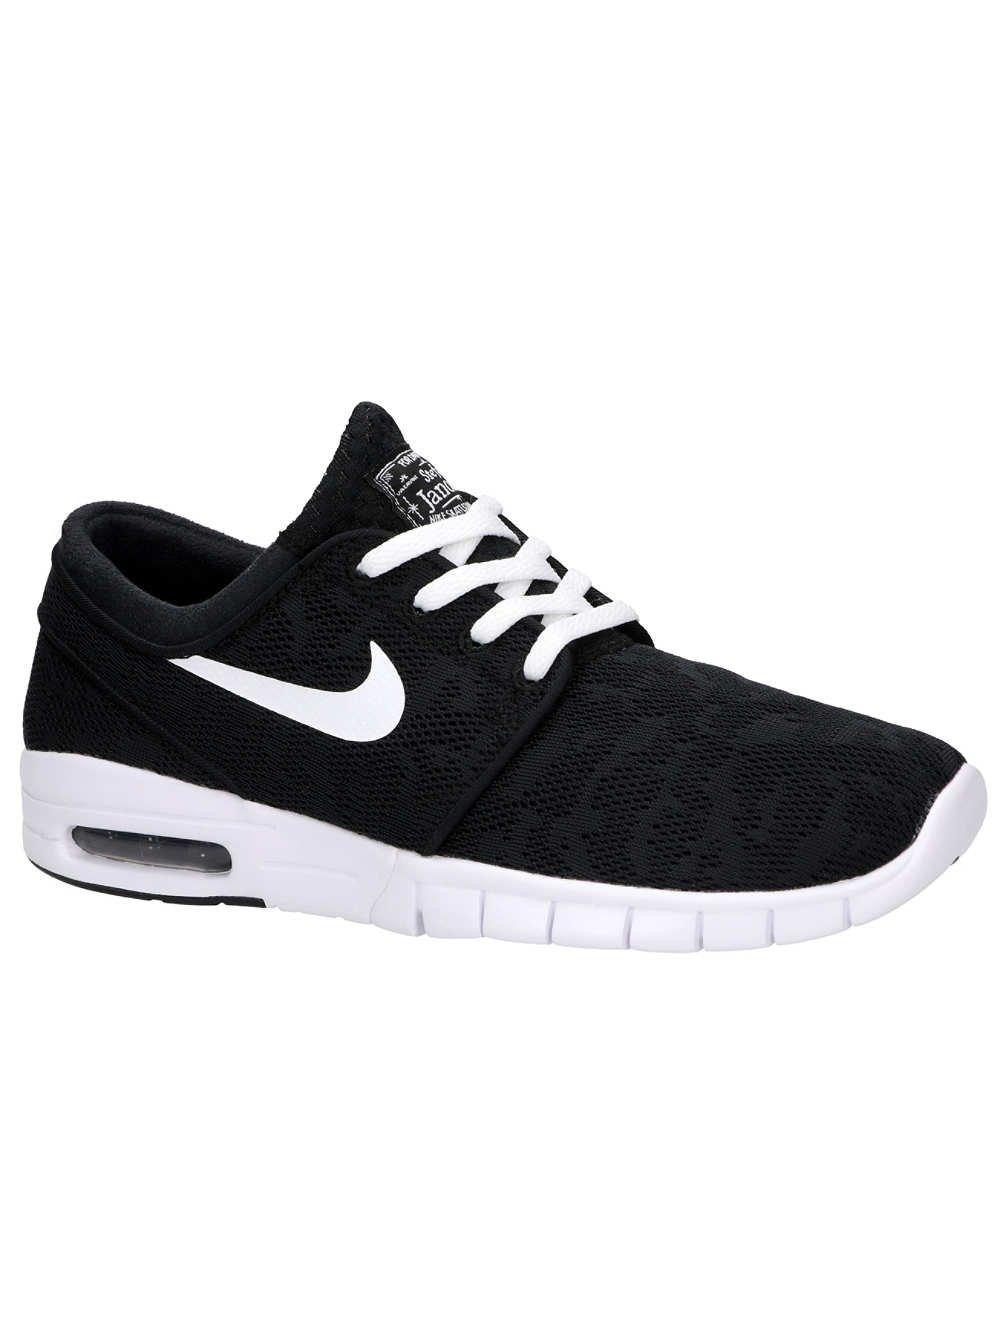 Nike Stefan Janoski Max Unisex-Erwachsene Sneakers  40 EU|Black/White